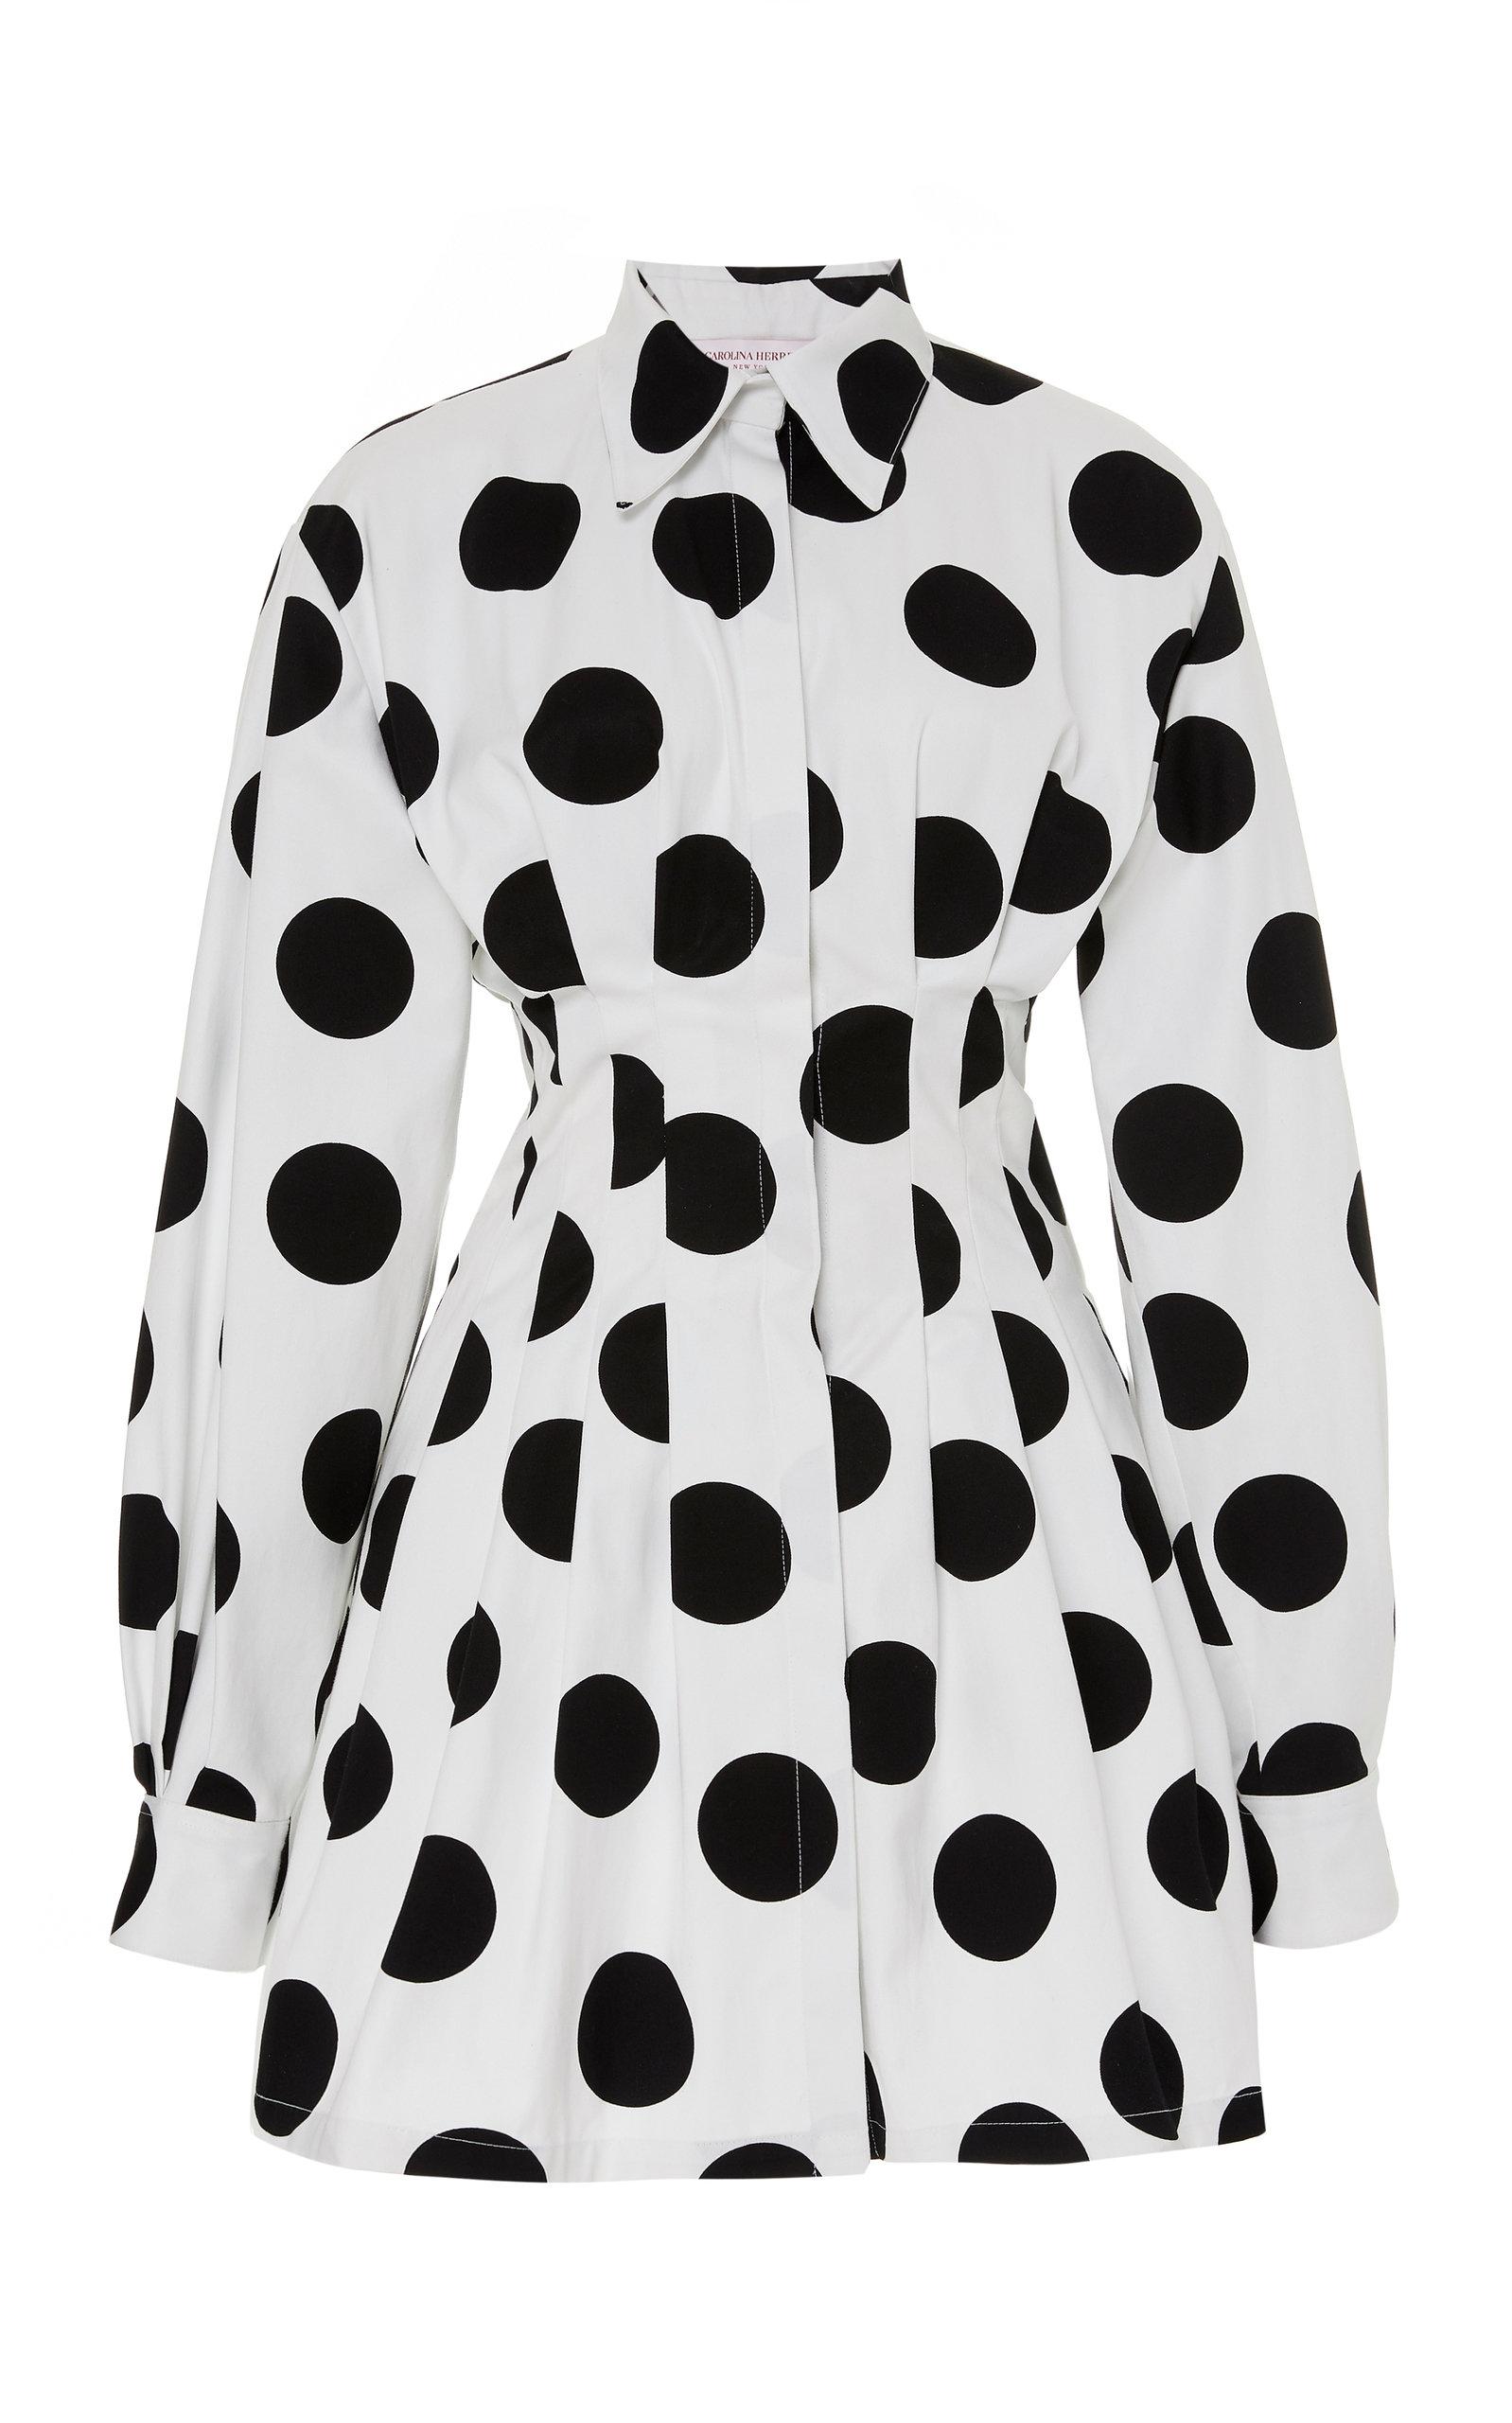 Buy Carolina Herrera Polka-Dot Cotton-Poplin Mini Dress online, shop Carolina Herrera at the best price